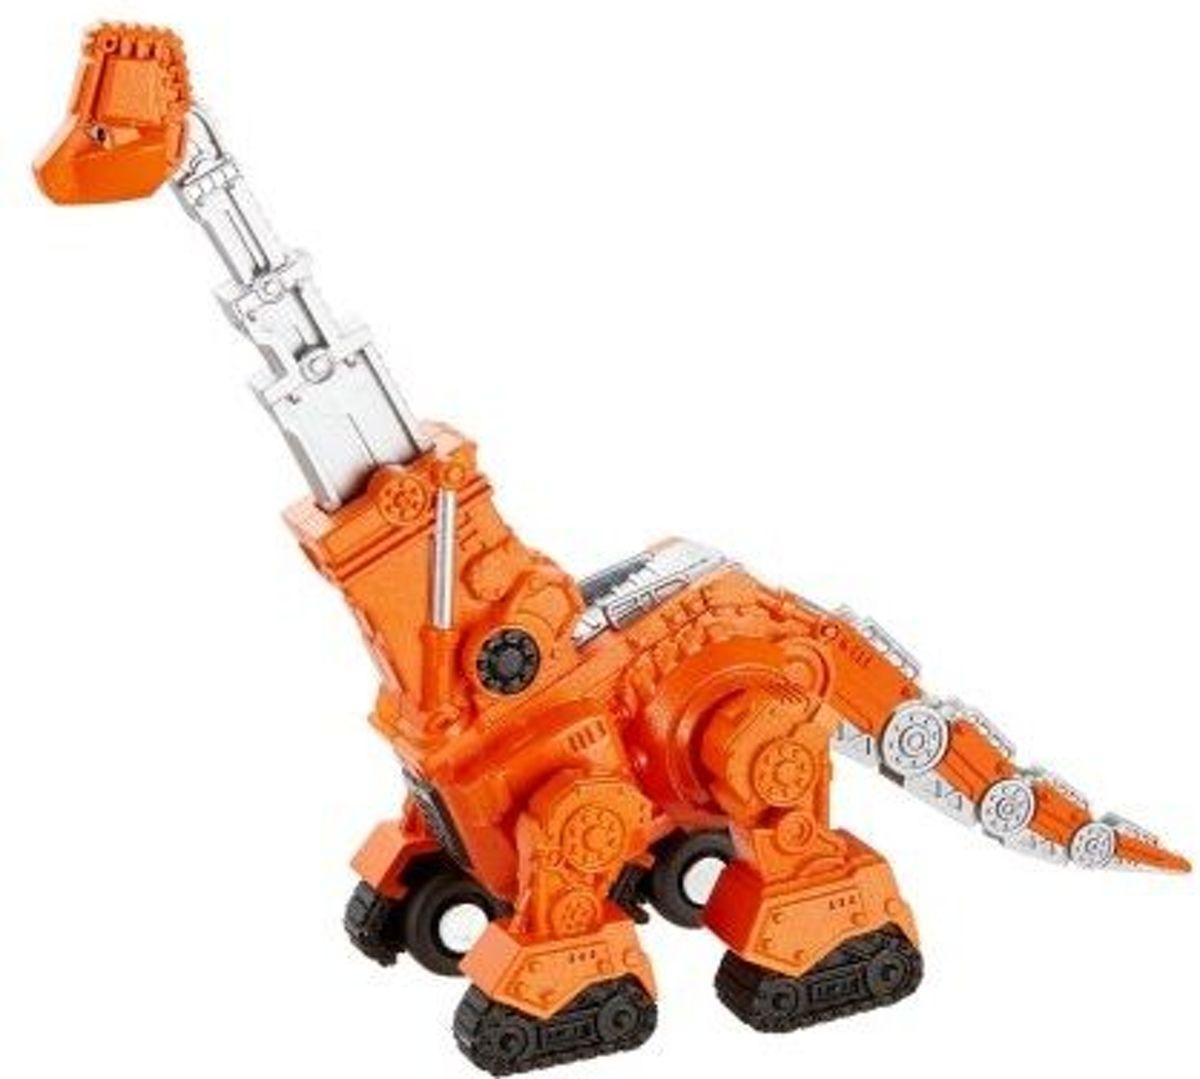 dinotruxPull & Go Dinotrux: Skya kopen